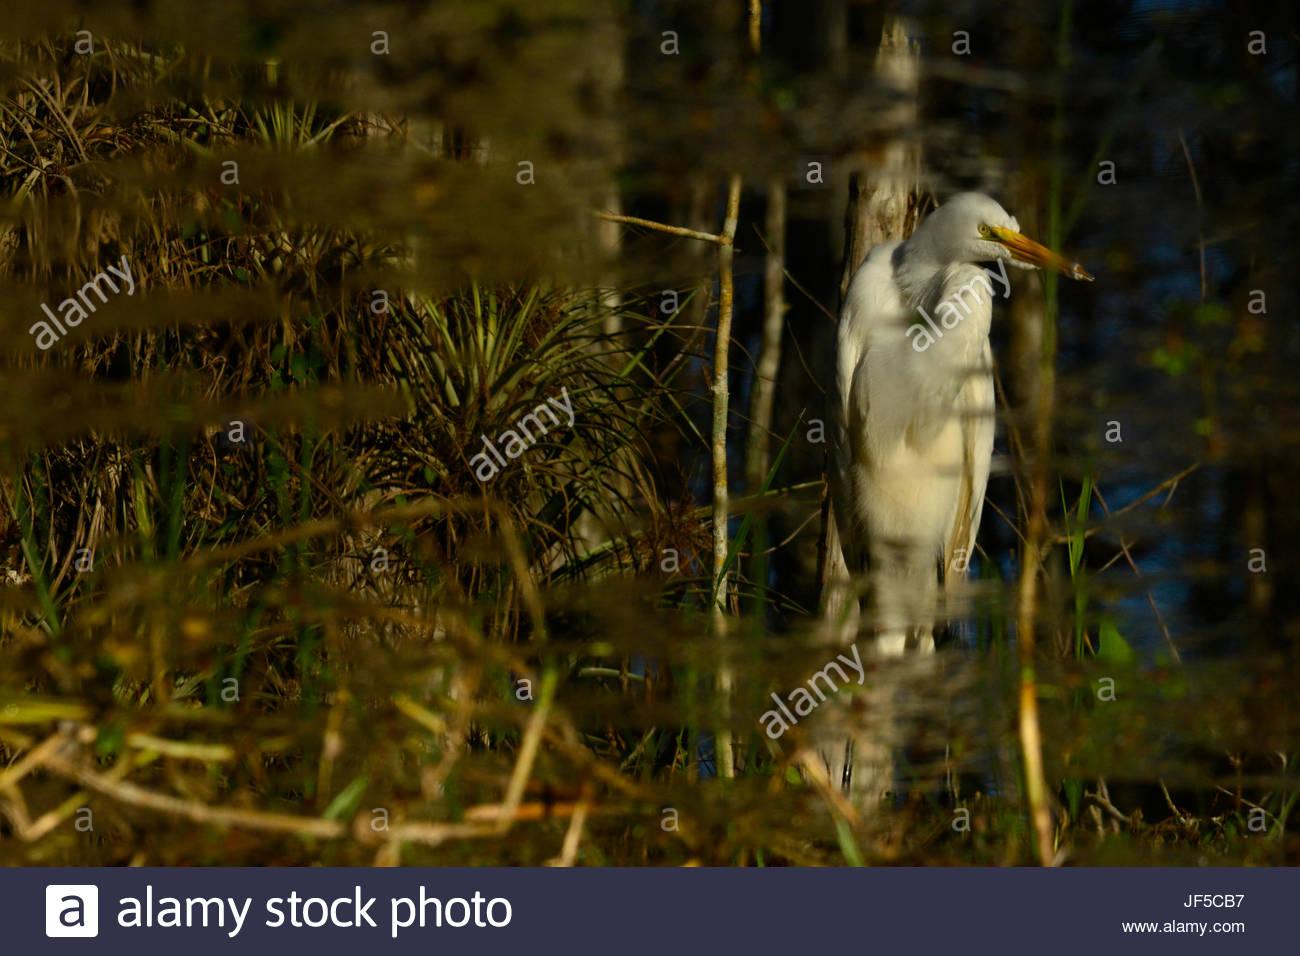 A standing white heron in dappled sunlight. - Stock Image